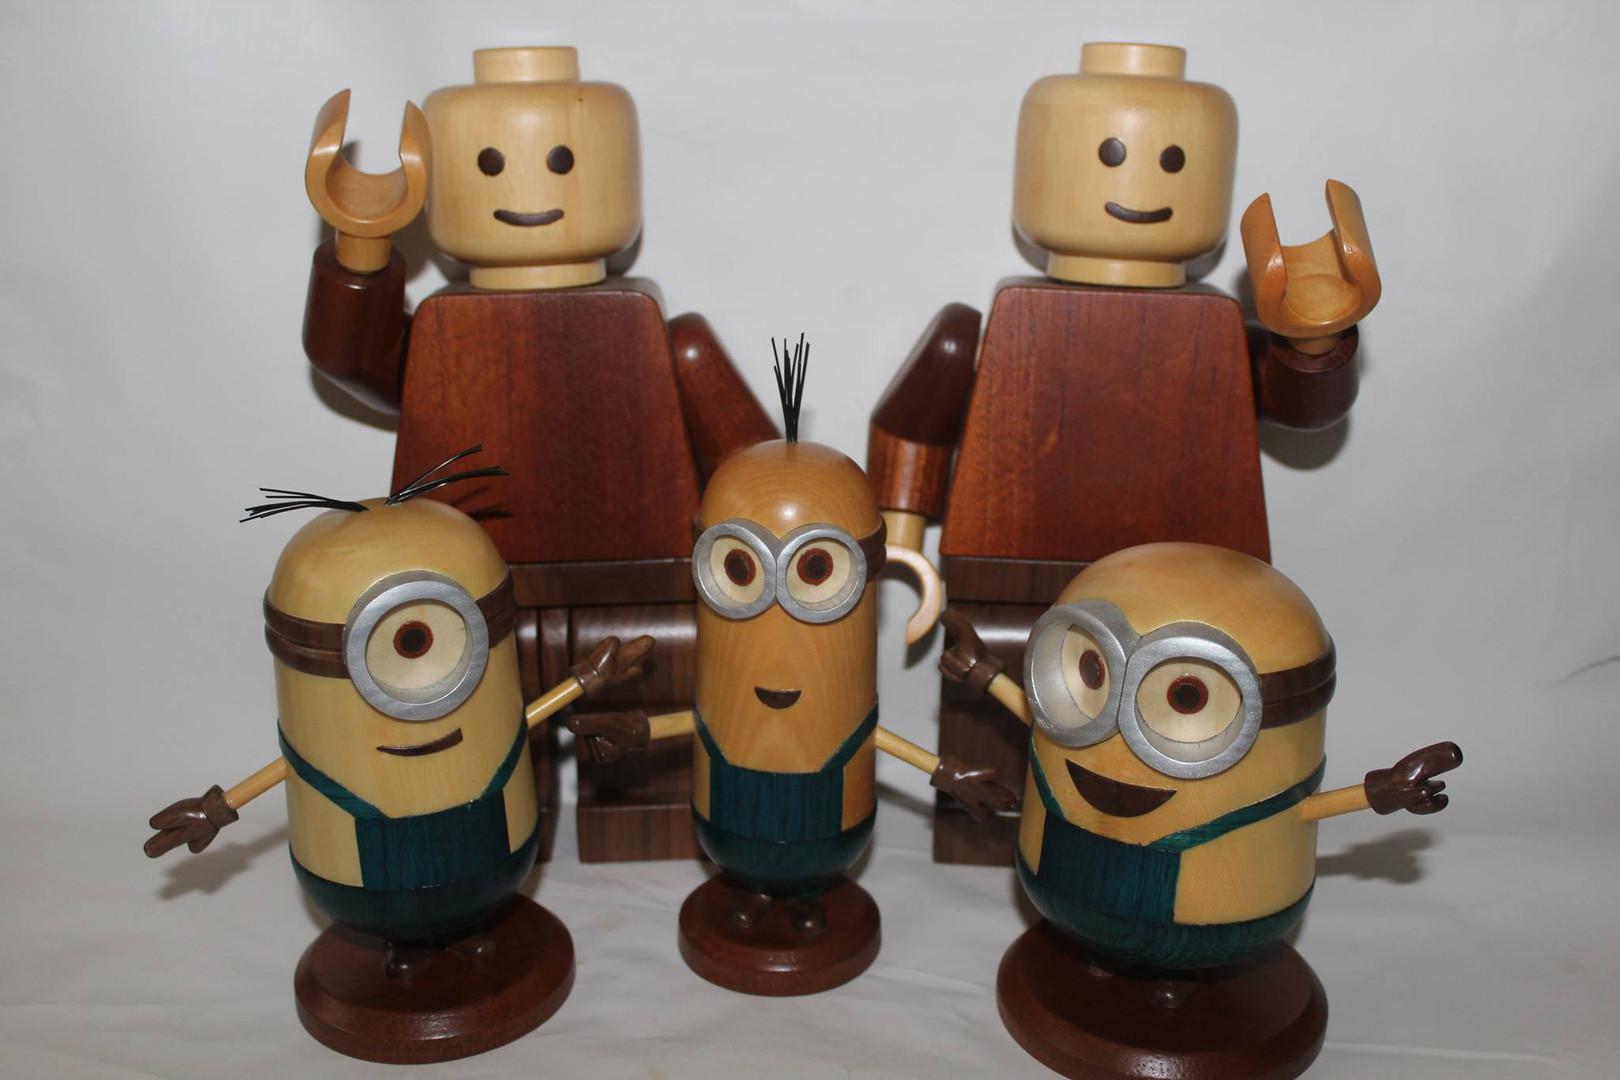 Lego men and minions